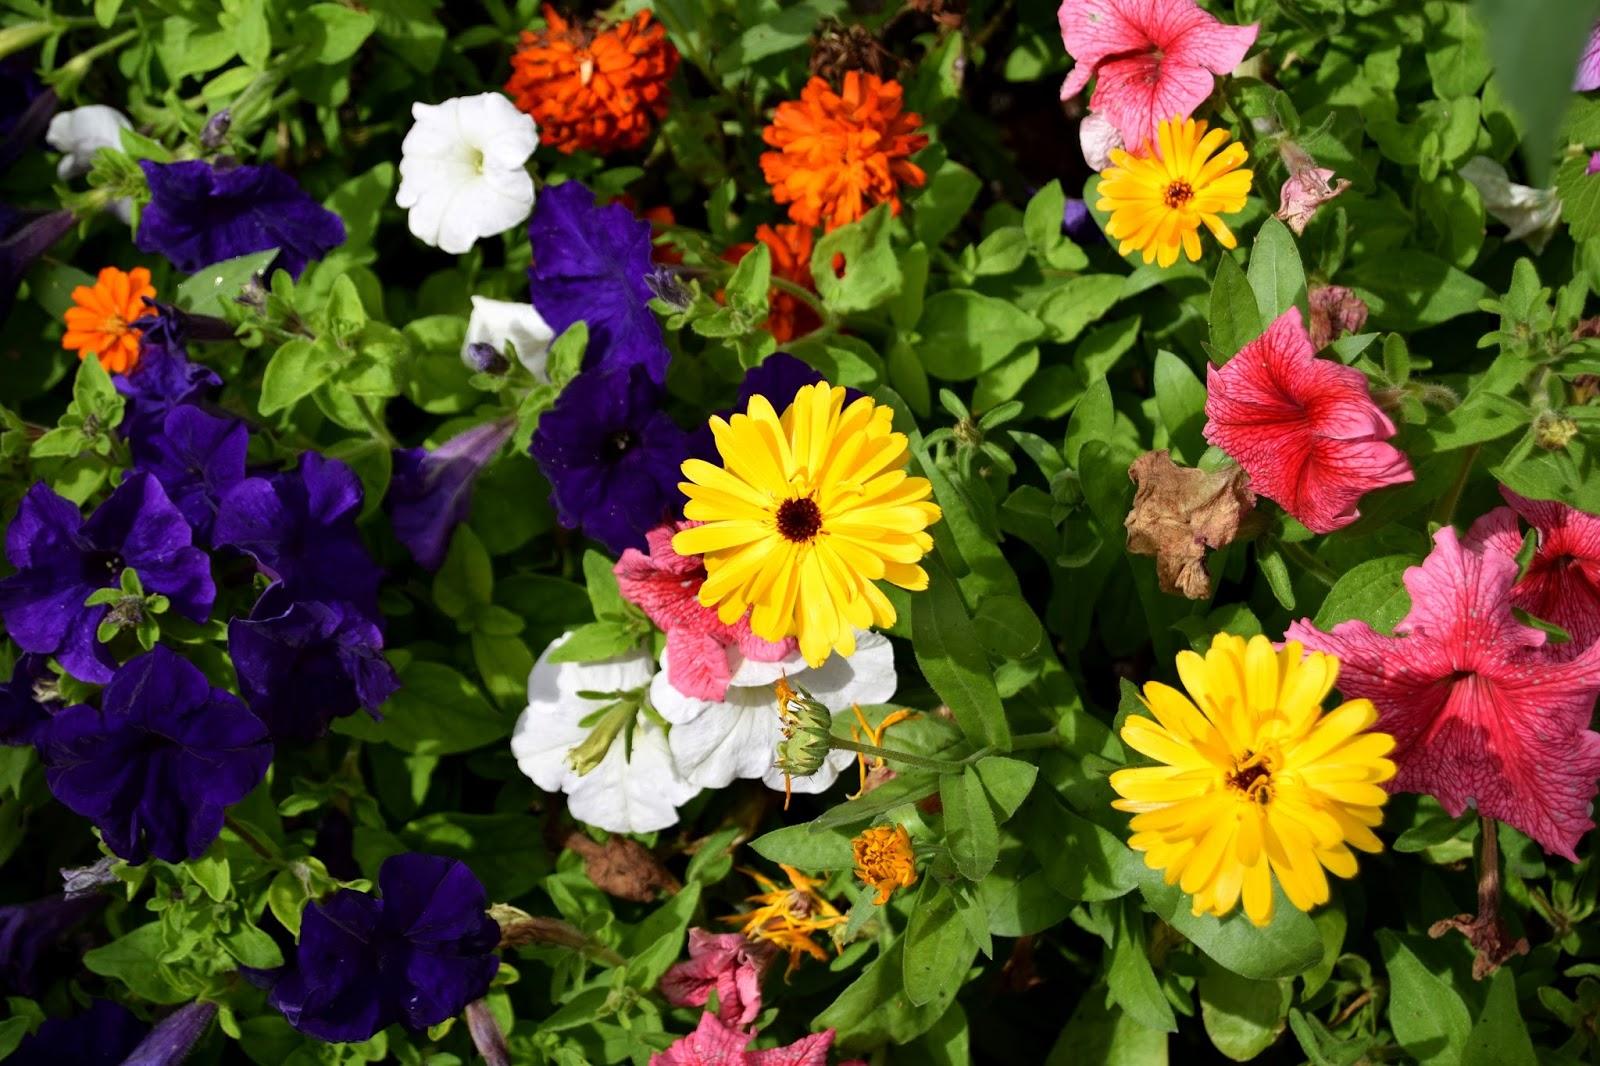 Bakewell flowers